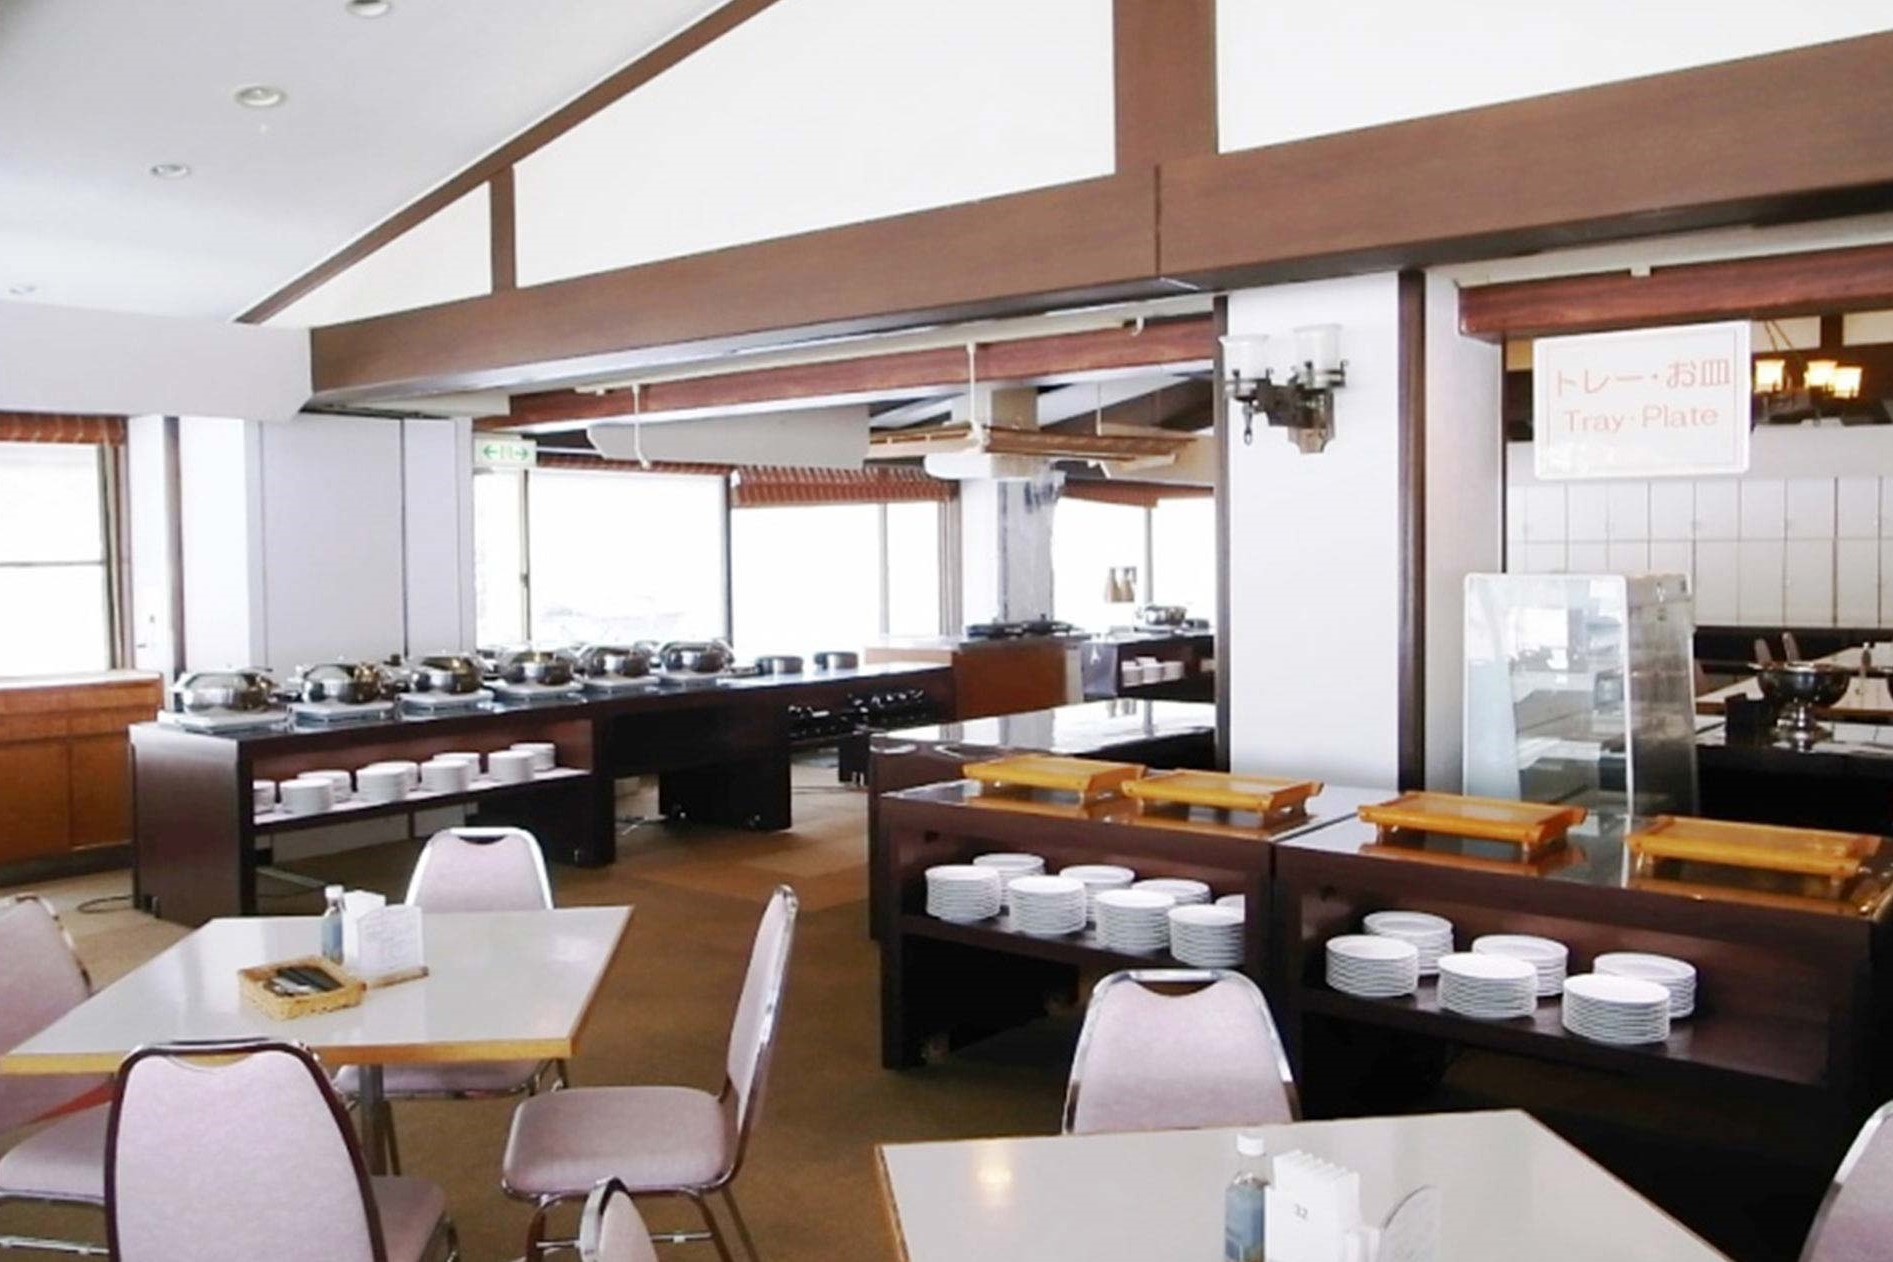 Manza Prince Hotel-restaurant 3 (O) (3.2)